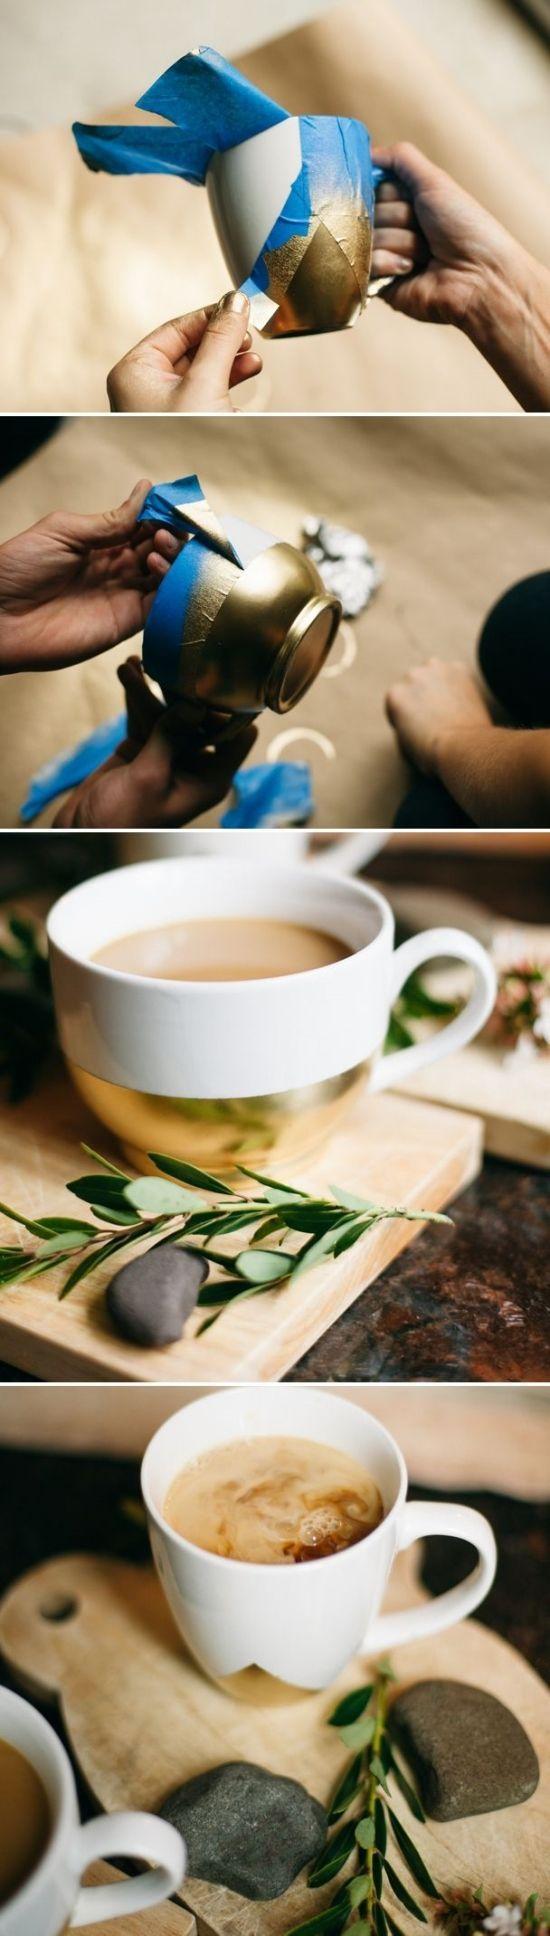 6 Incredible DIY Ways to Transform Plain Mugs into Art